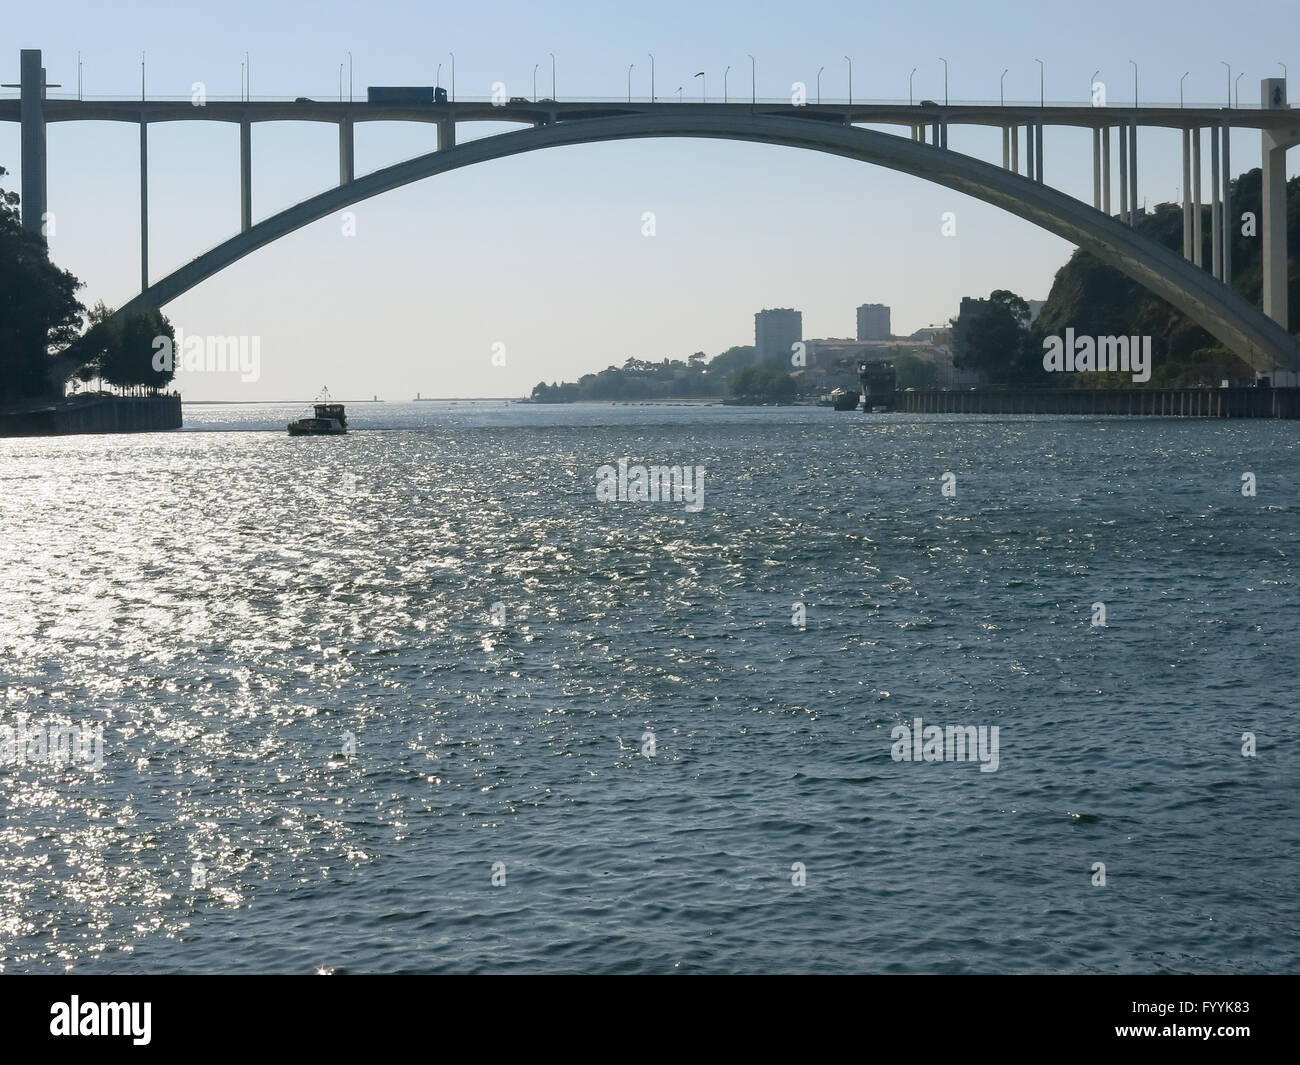 Ponte da Arrabida, last bridge over Douro River towards Atlantic Ocean, Porto, Portugal Stock Photo